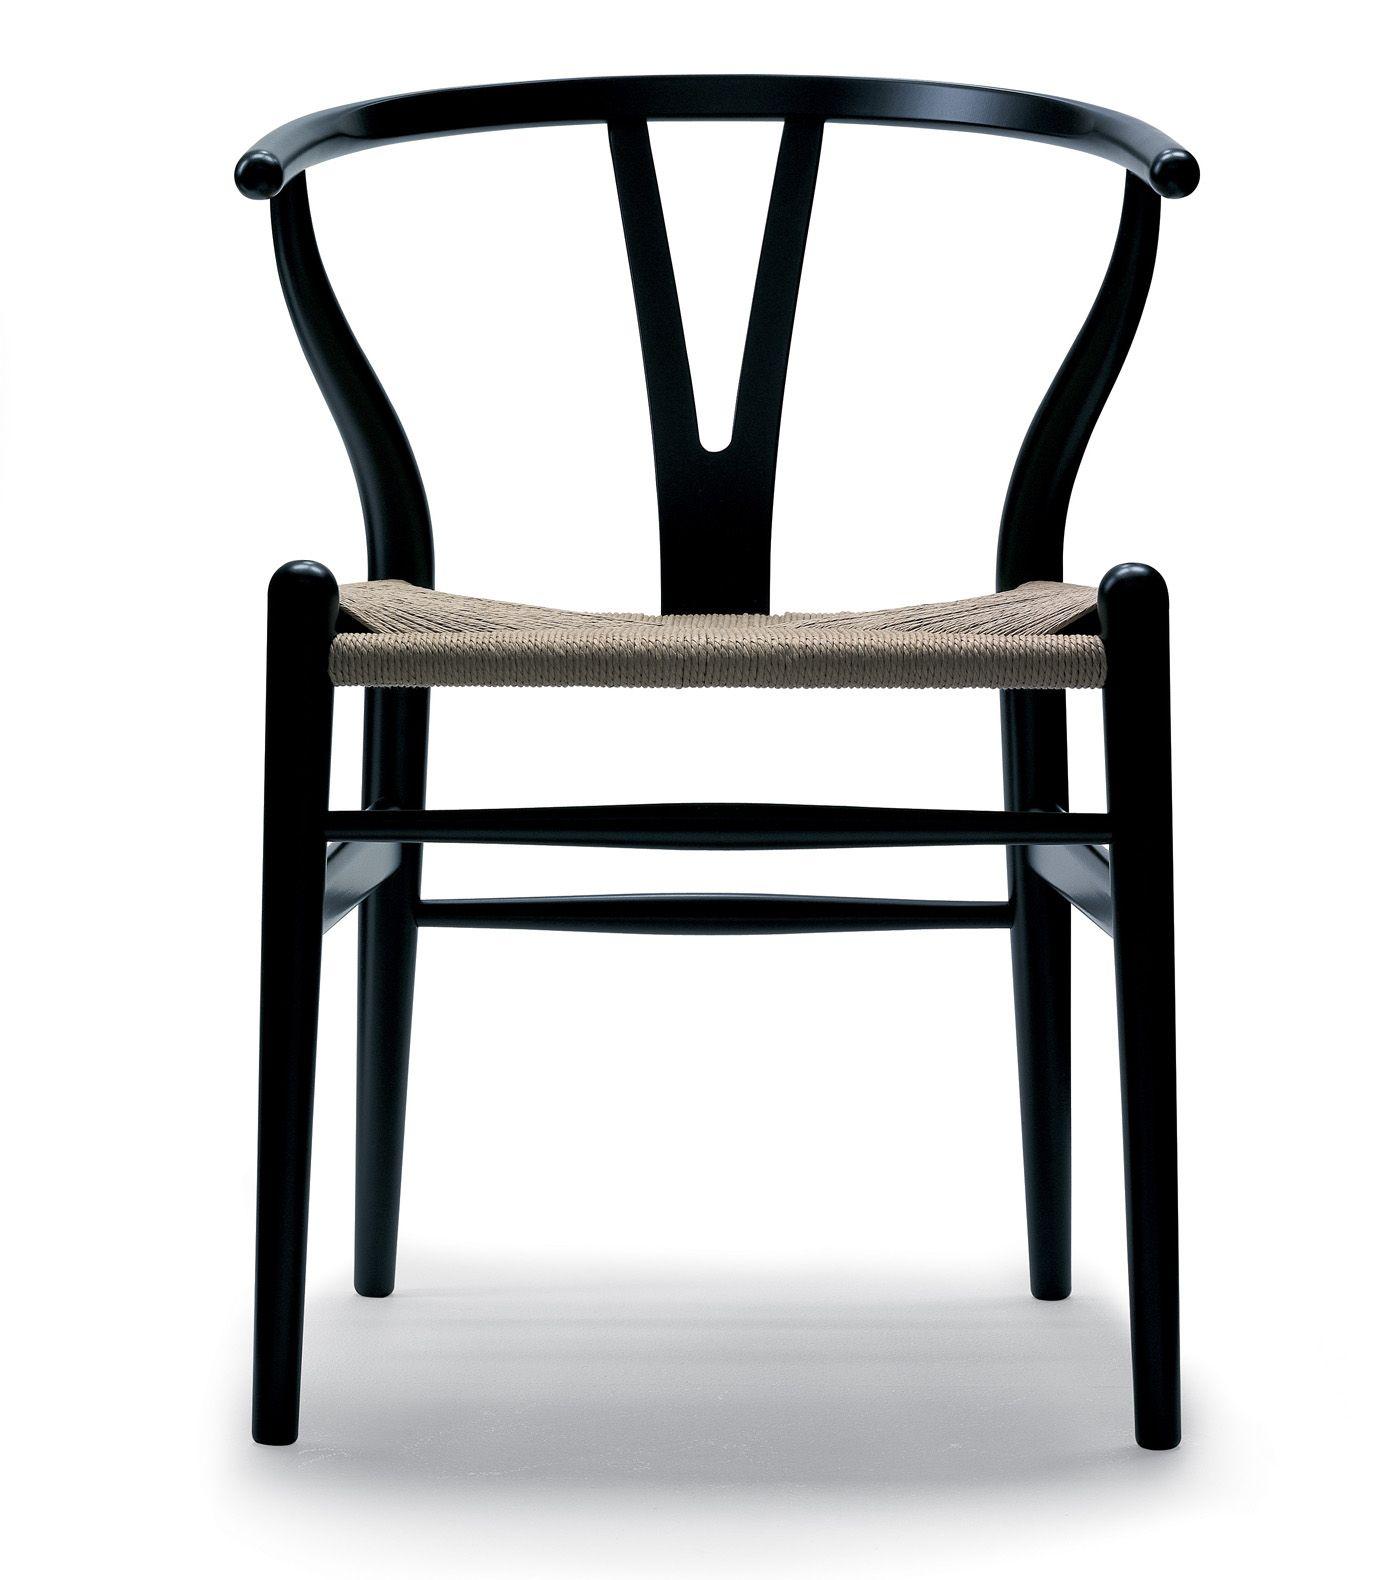 Wishbone chair Hans J Wegner